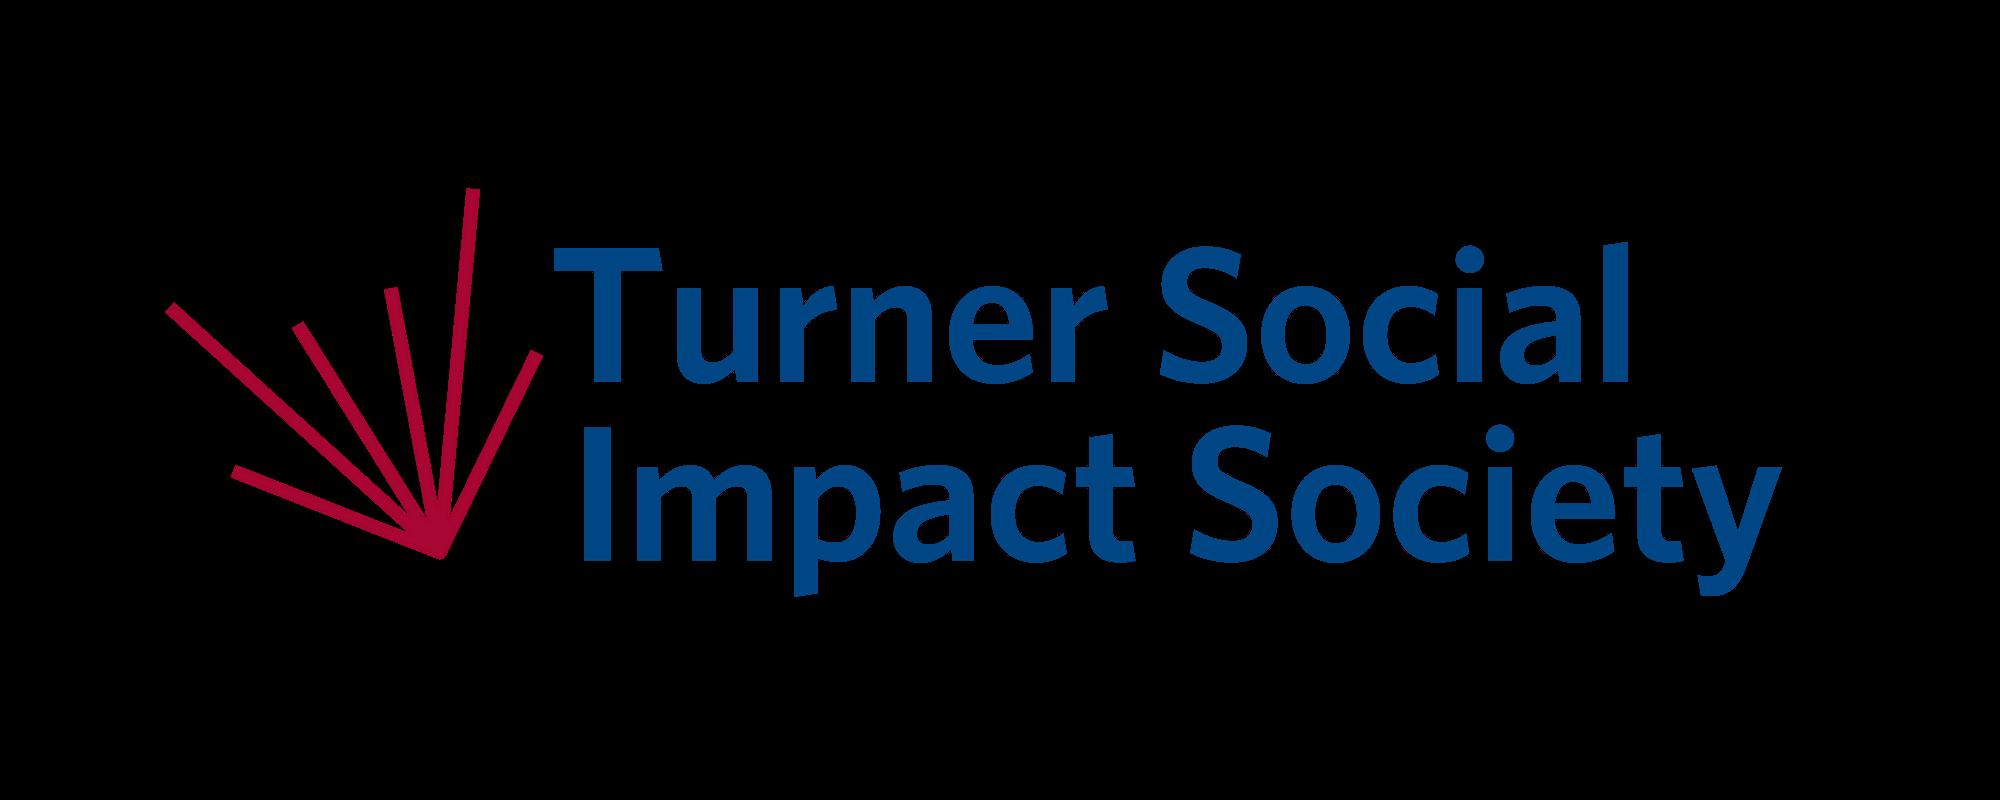 Turner Social Impact Society logo